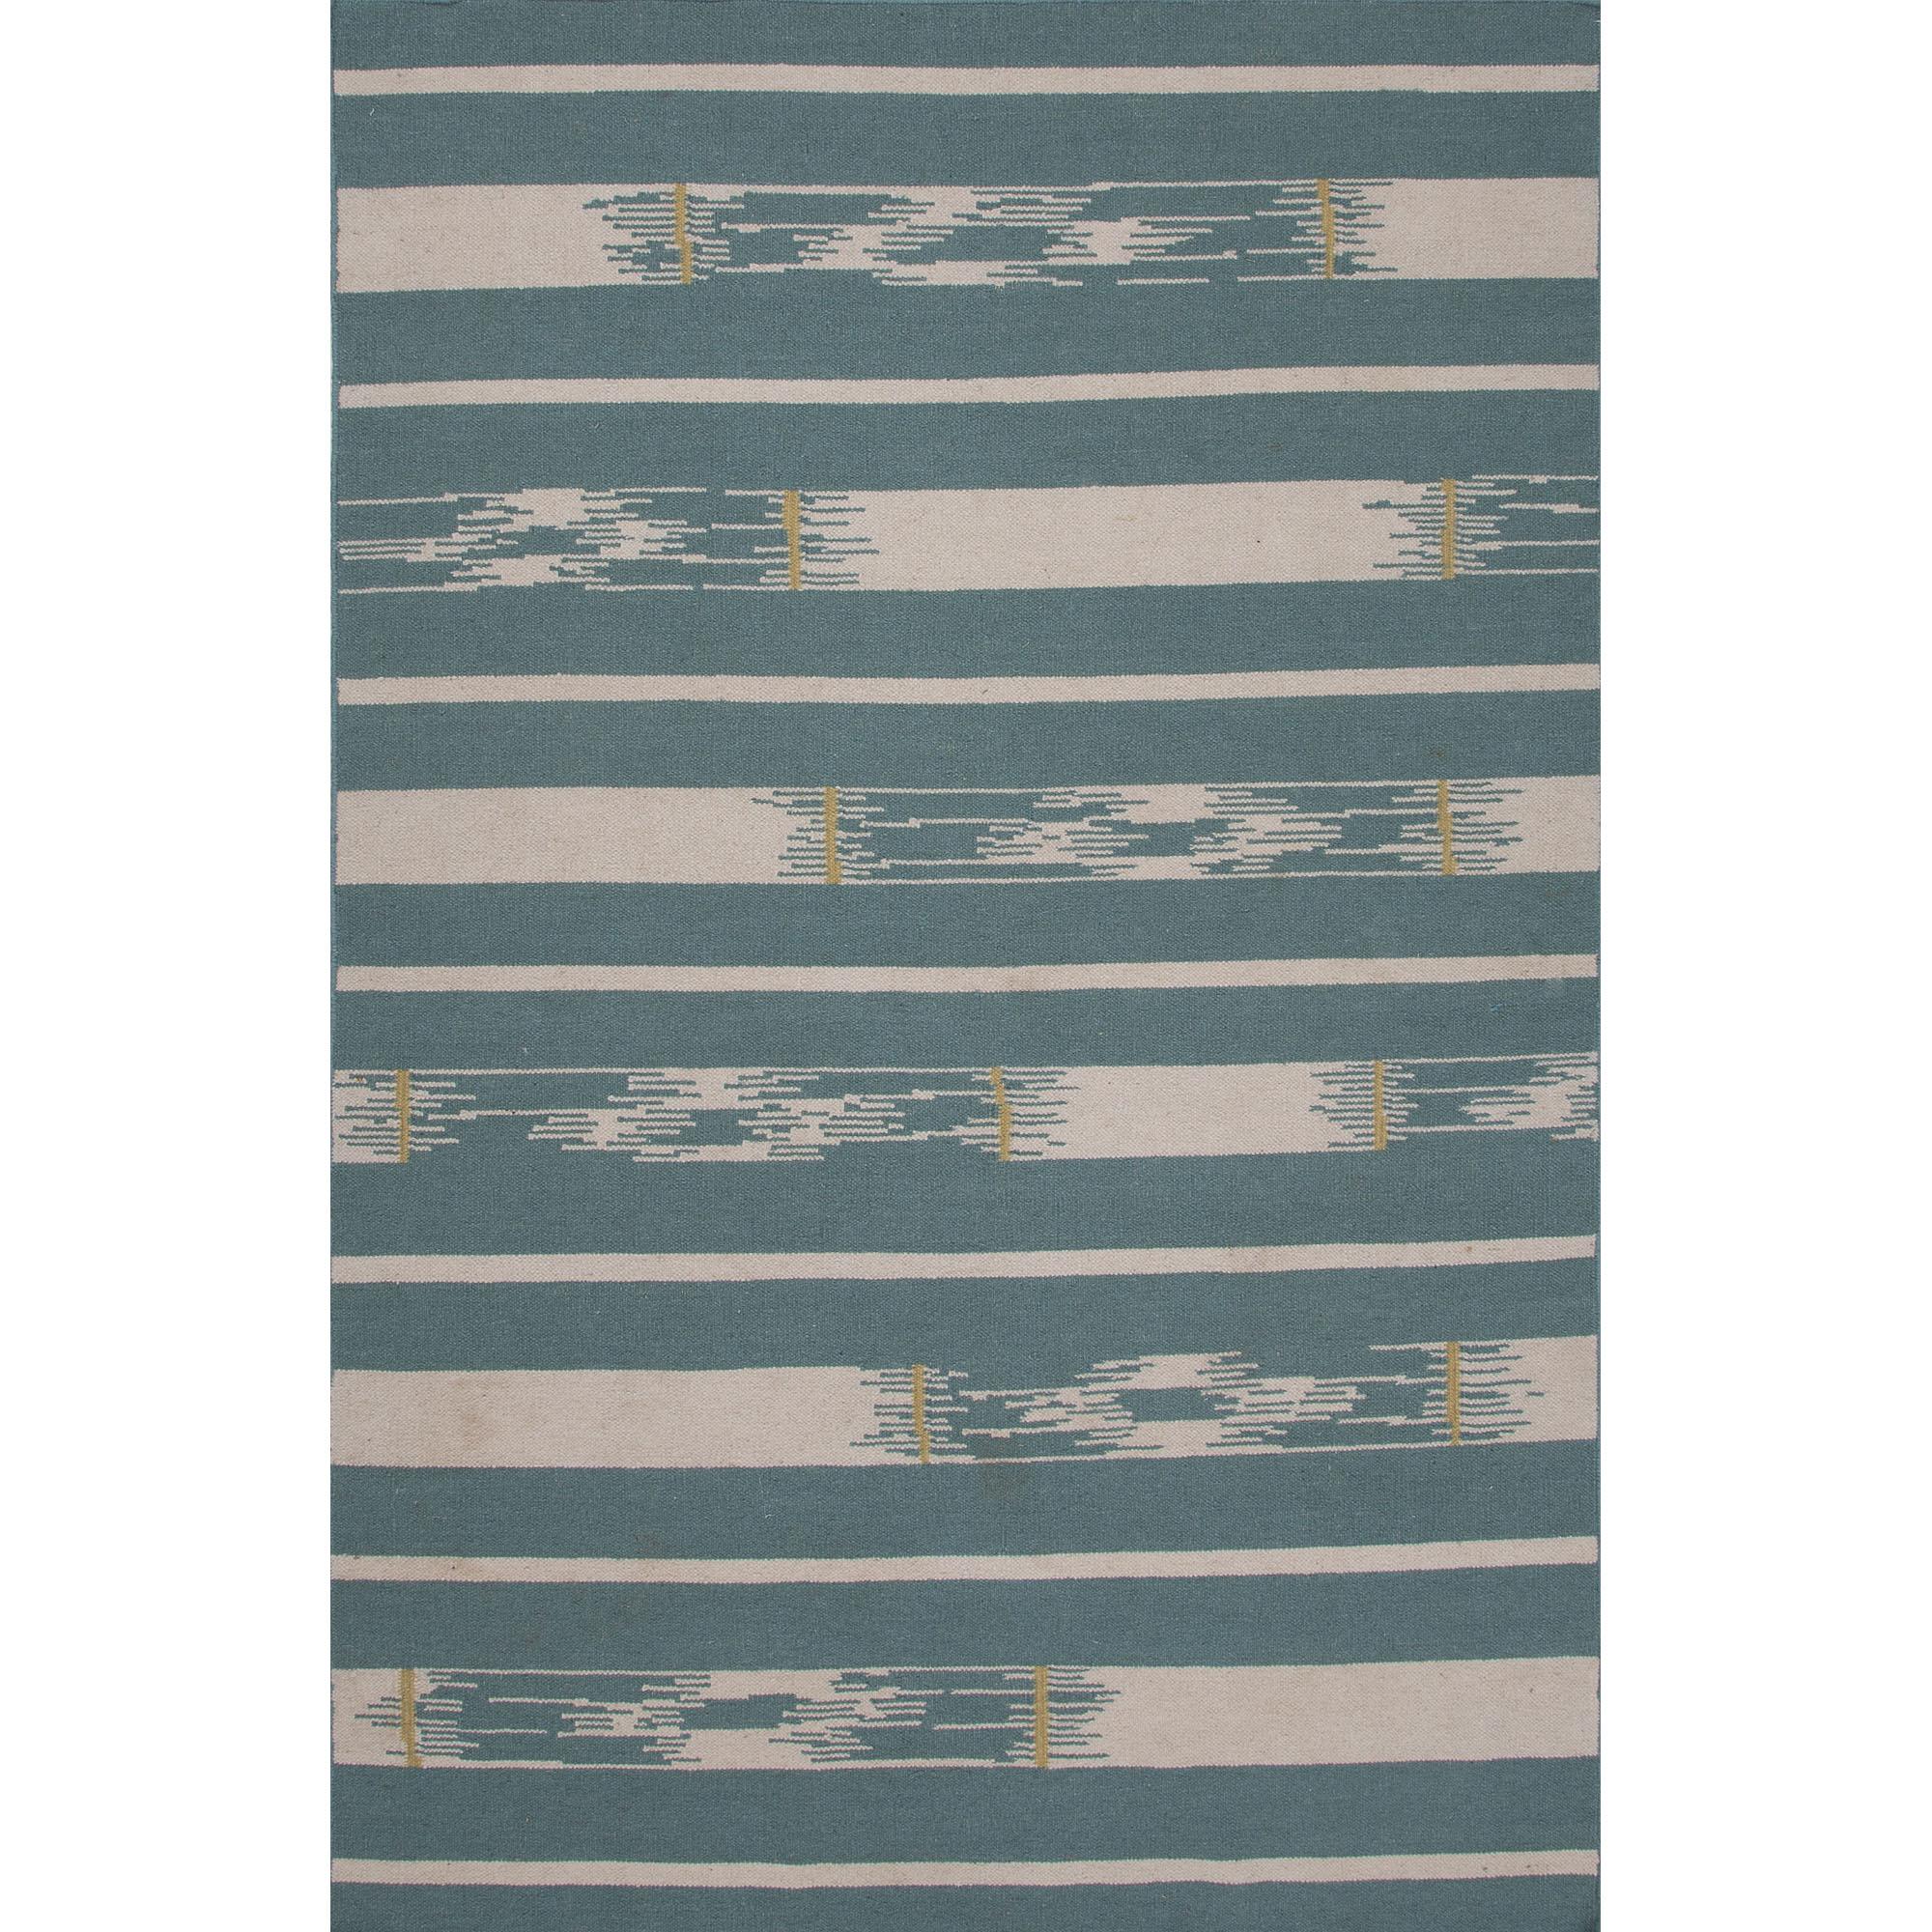 JAIPUR Rugs Traditions Modern Flat Weave 2 x 3 Rug - Item Number: RUG122238